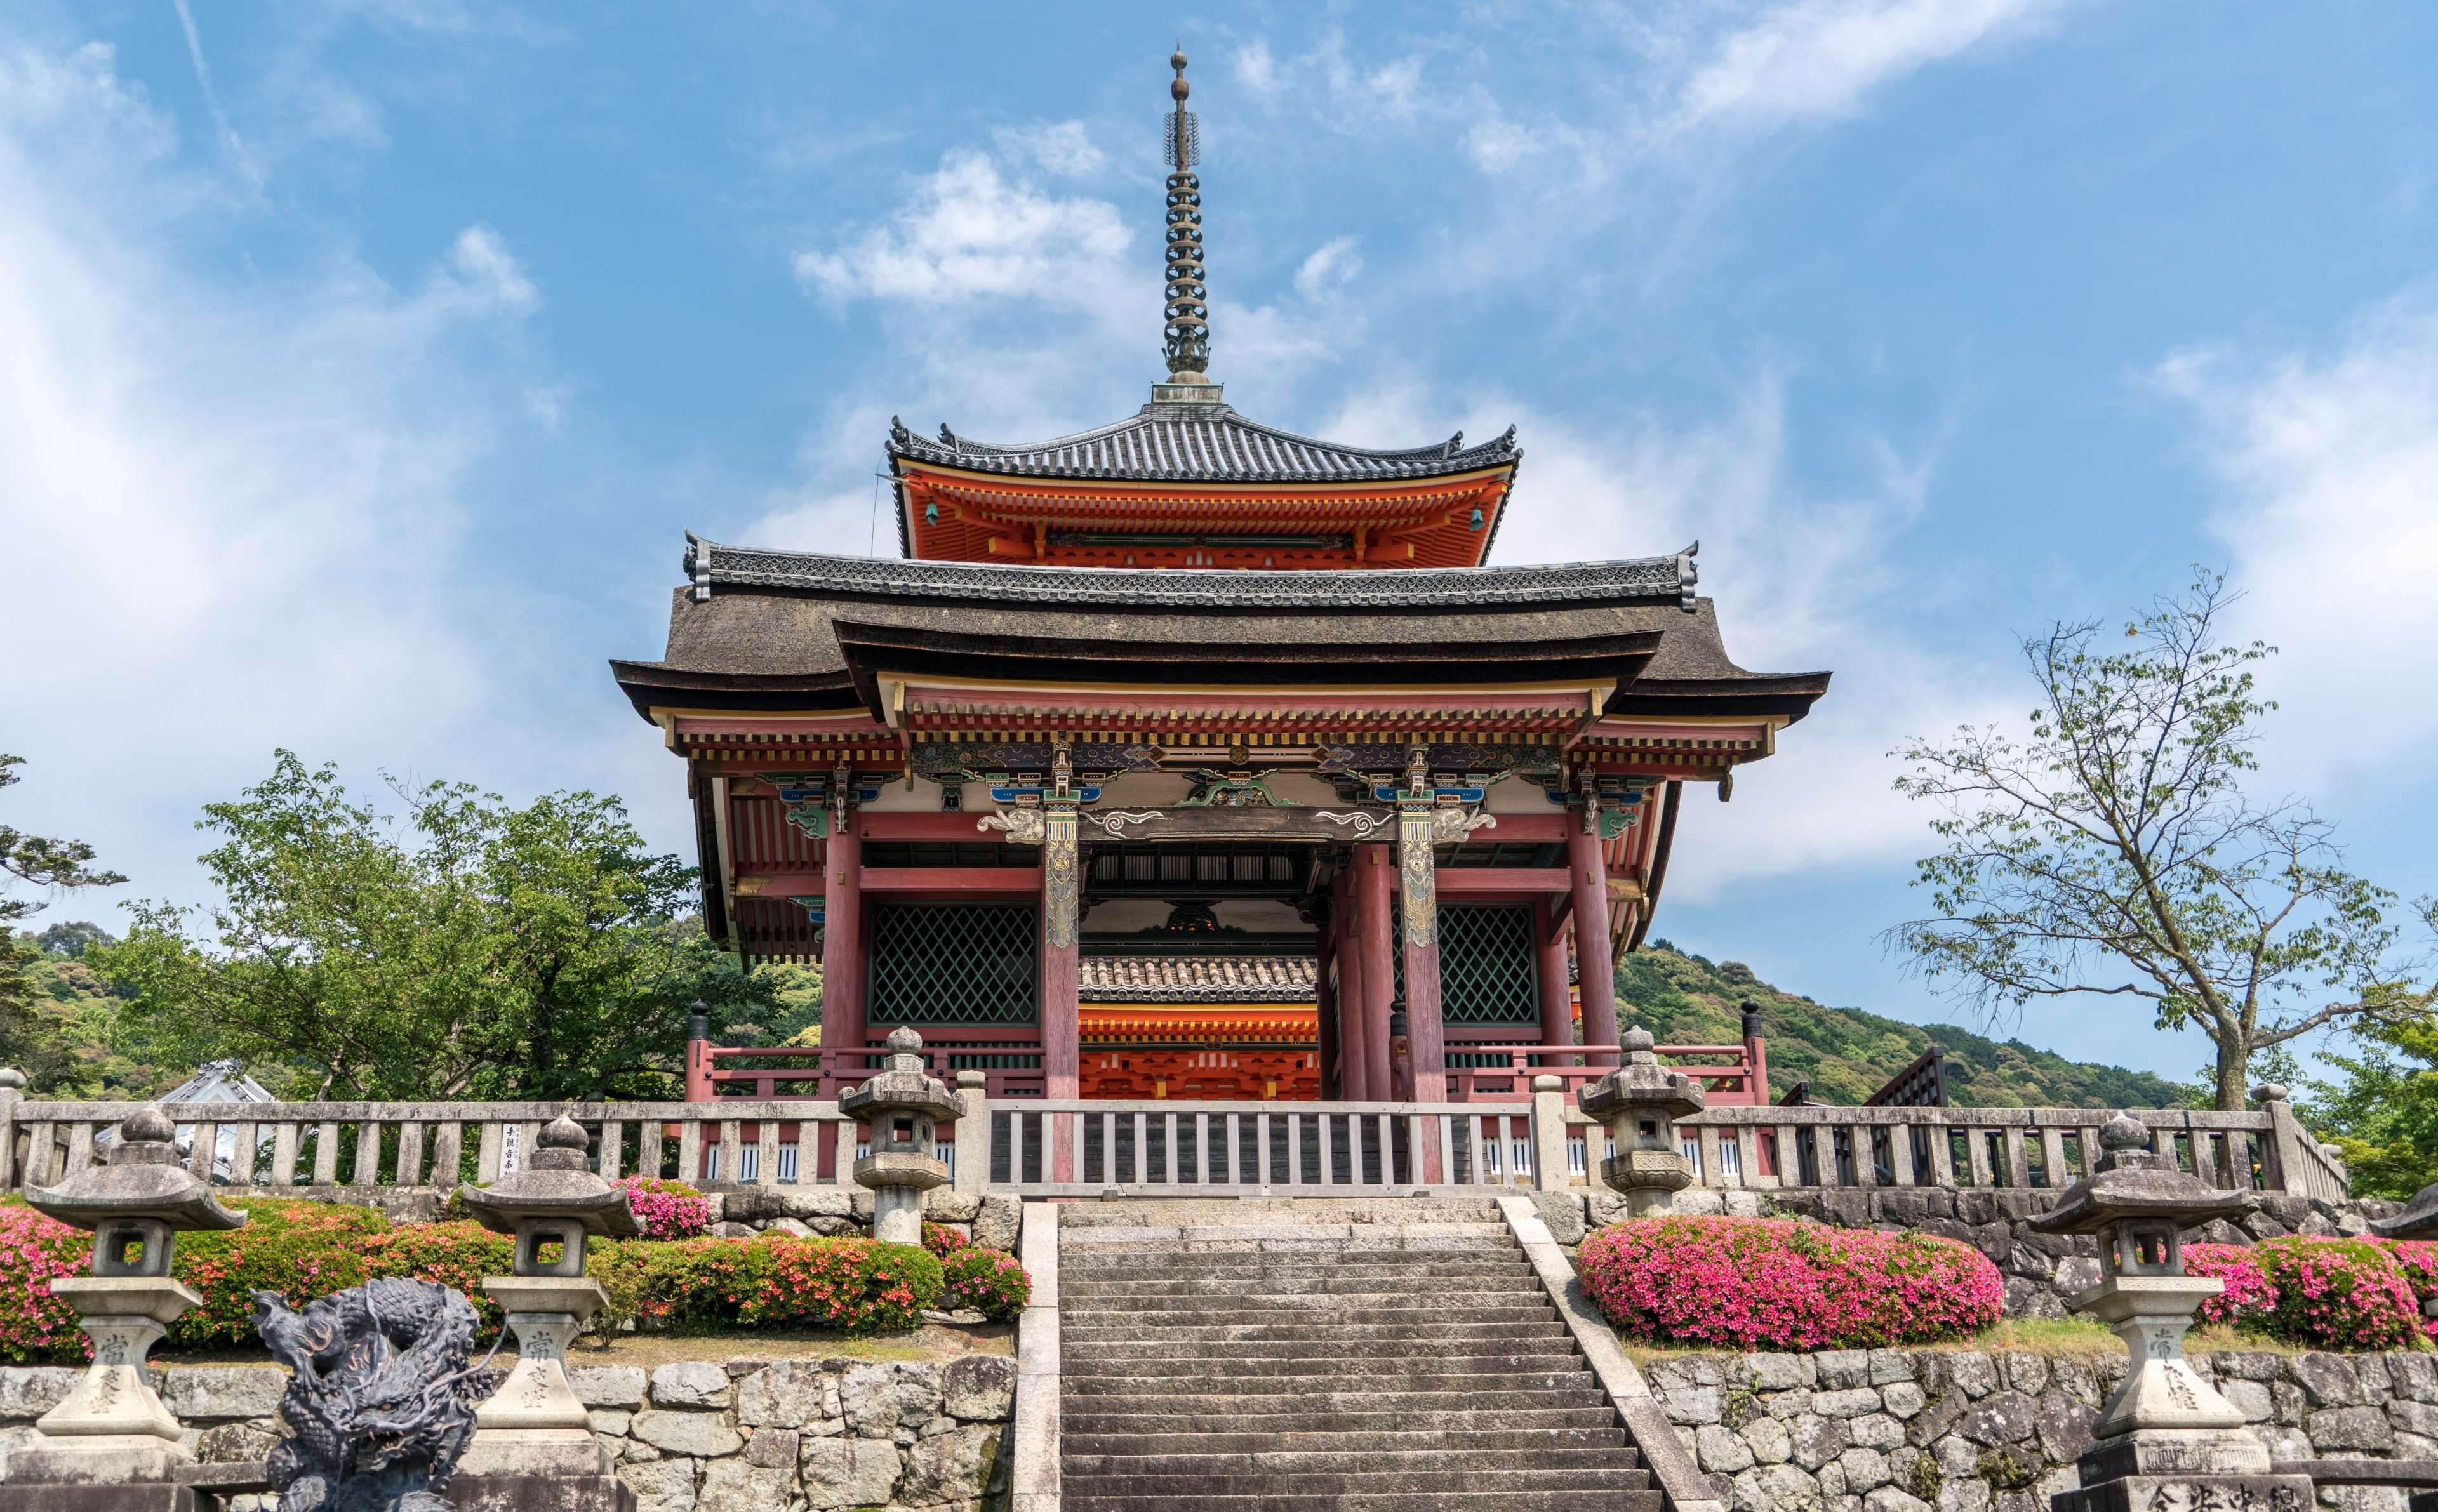 ancient architecture asia attraction culture famous historic